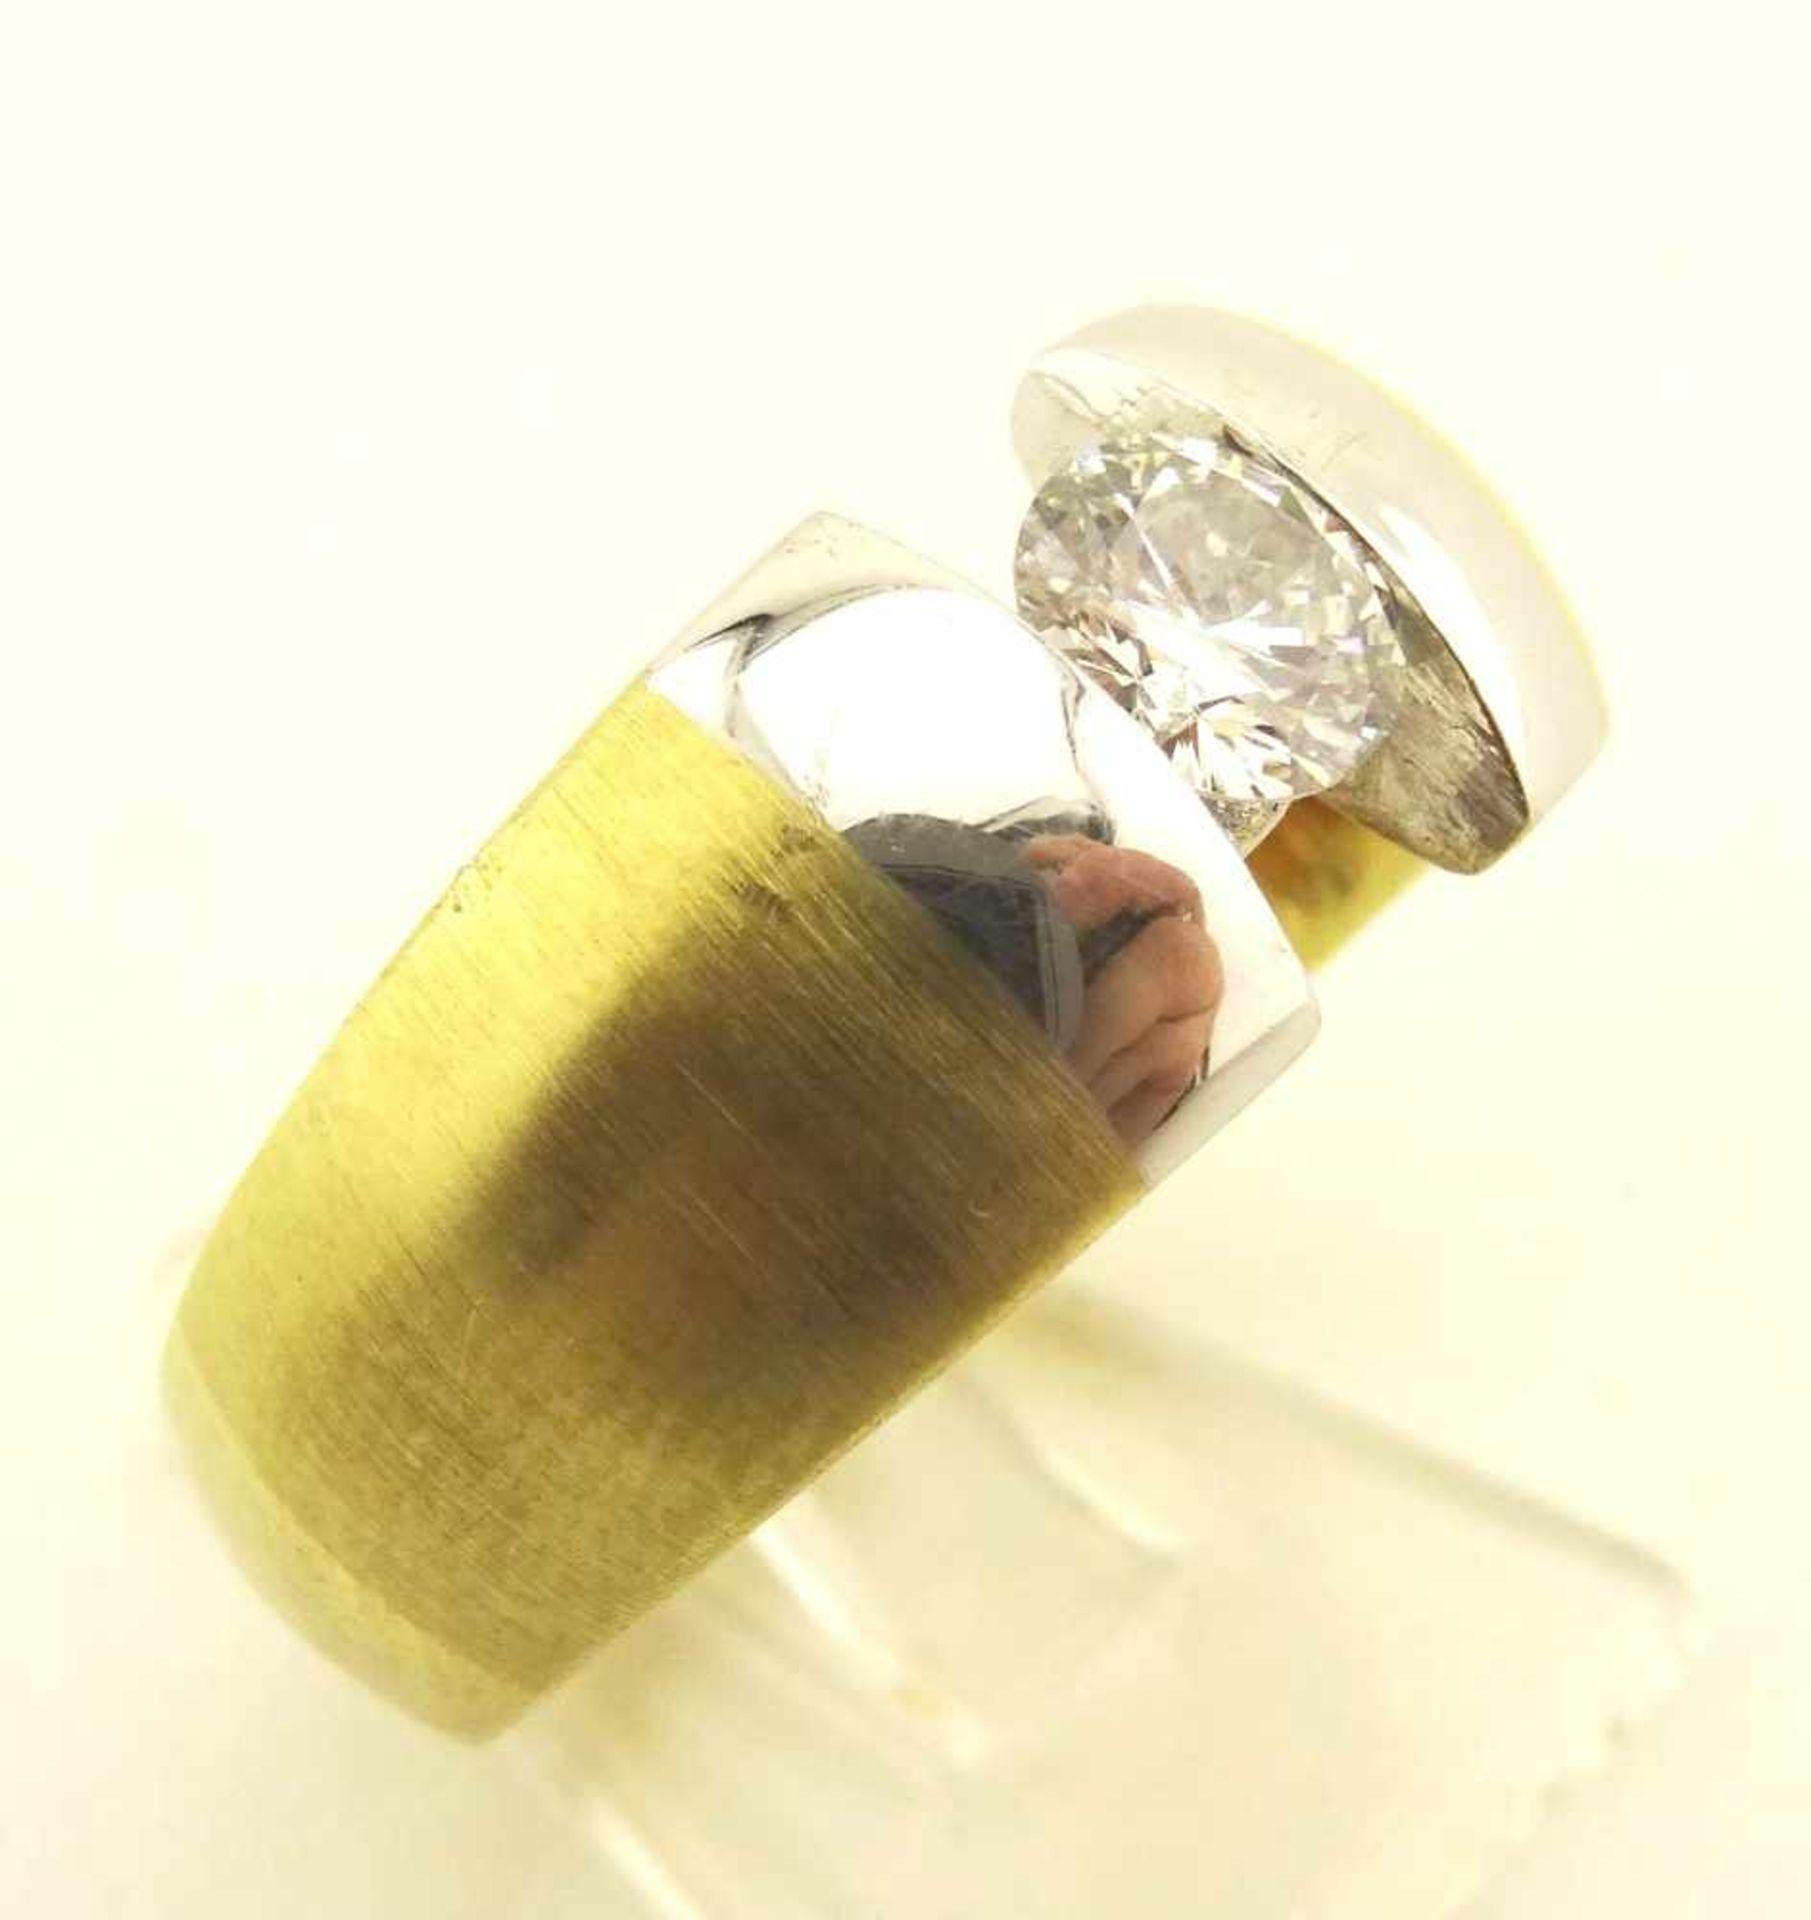 Los 30 - Damen o. Herren Brillantring 750 Gold mit Brillant ca. 0,55ct. W/ pi, in Gelb- Weißgold, RG 59,